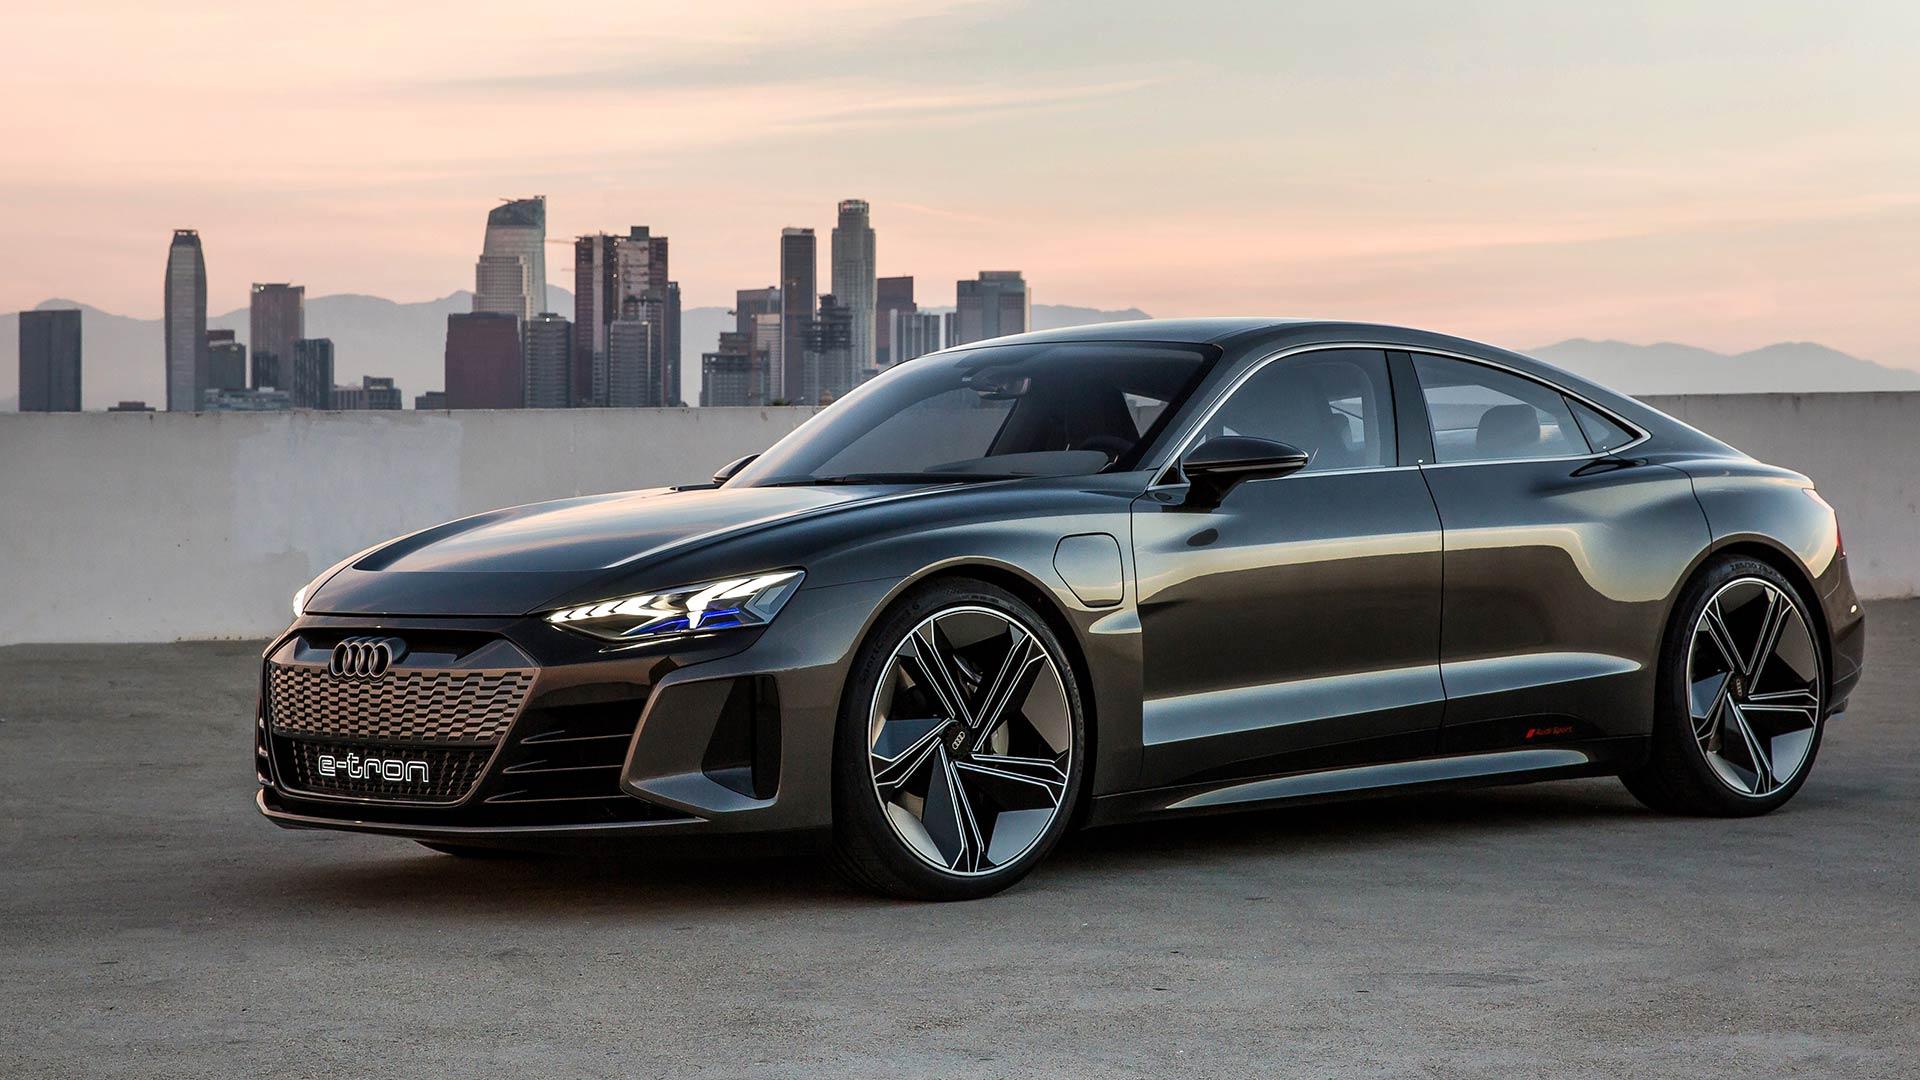 Captain Marvel meets the Audi e-tron SUV